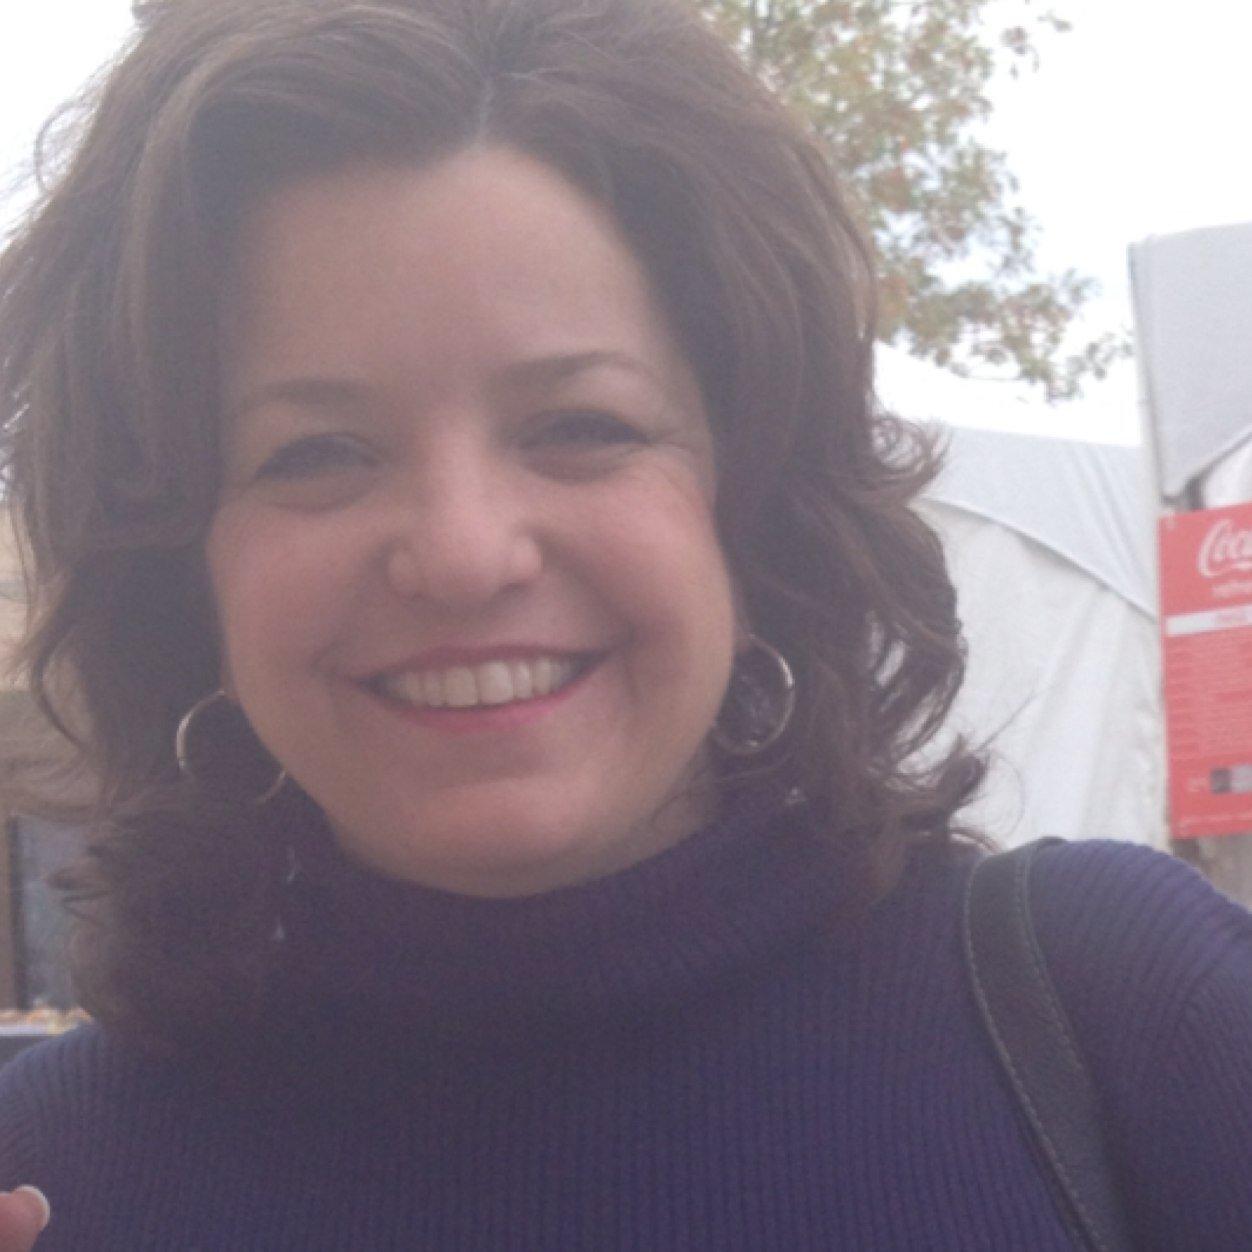 Angie Bates